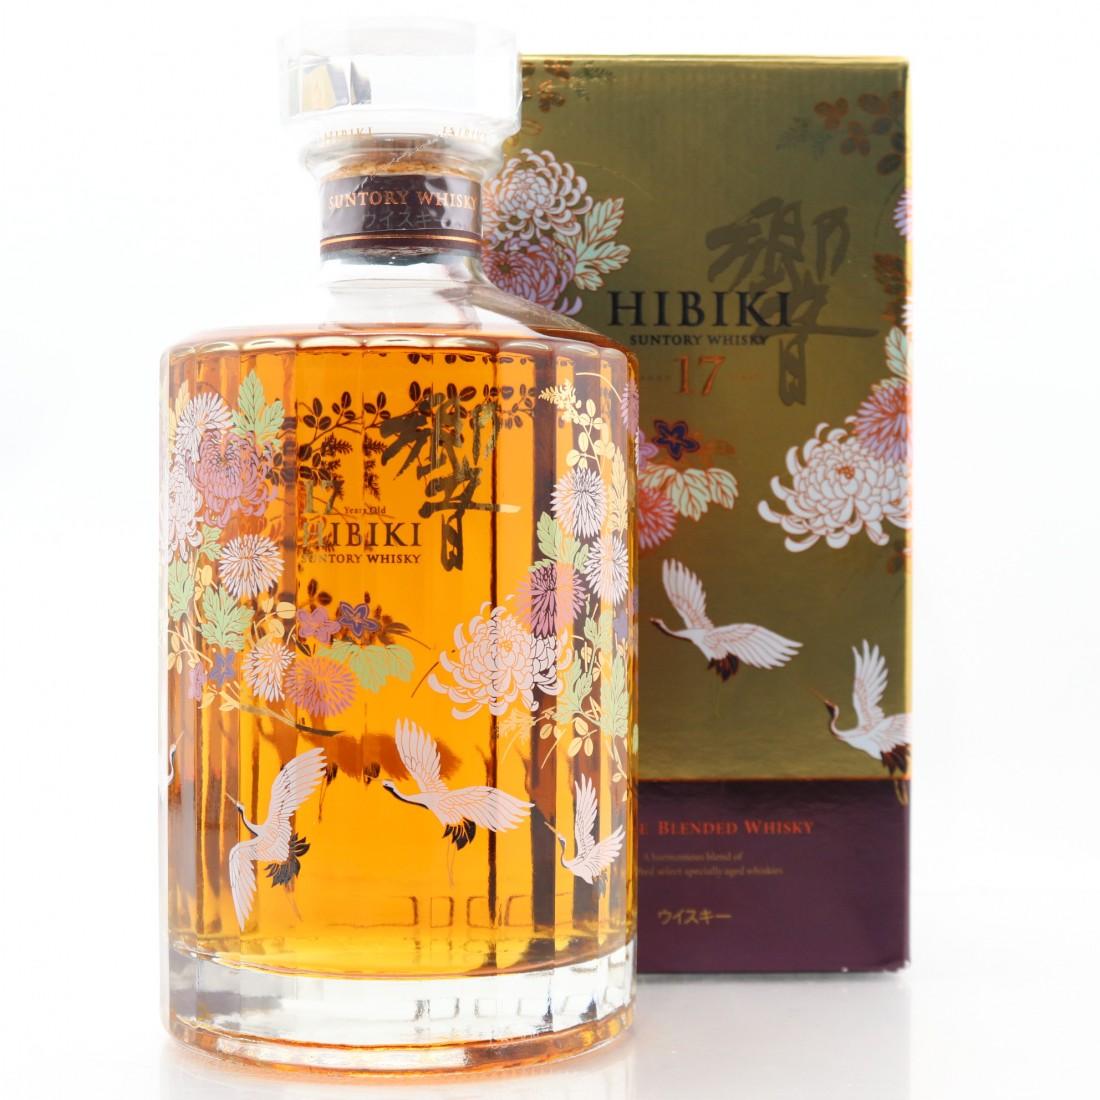 Hibiki 17 Year Old Kacho Fugestu Limited Edition